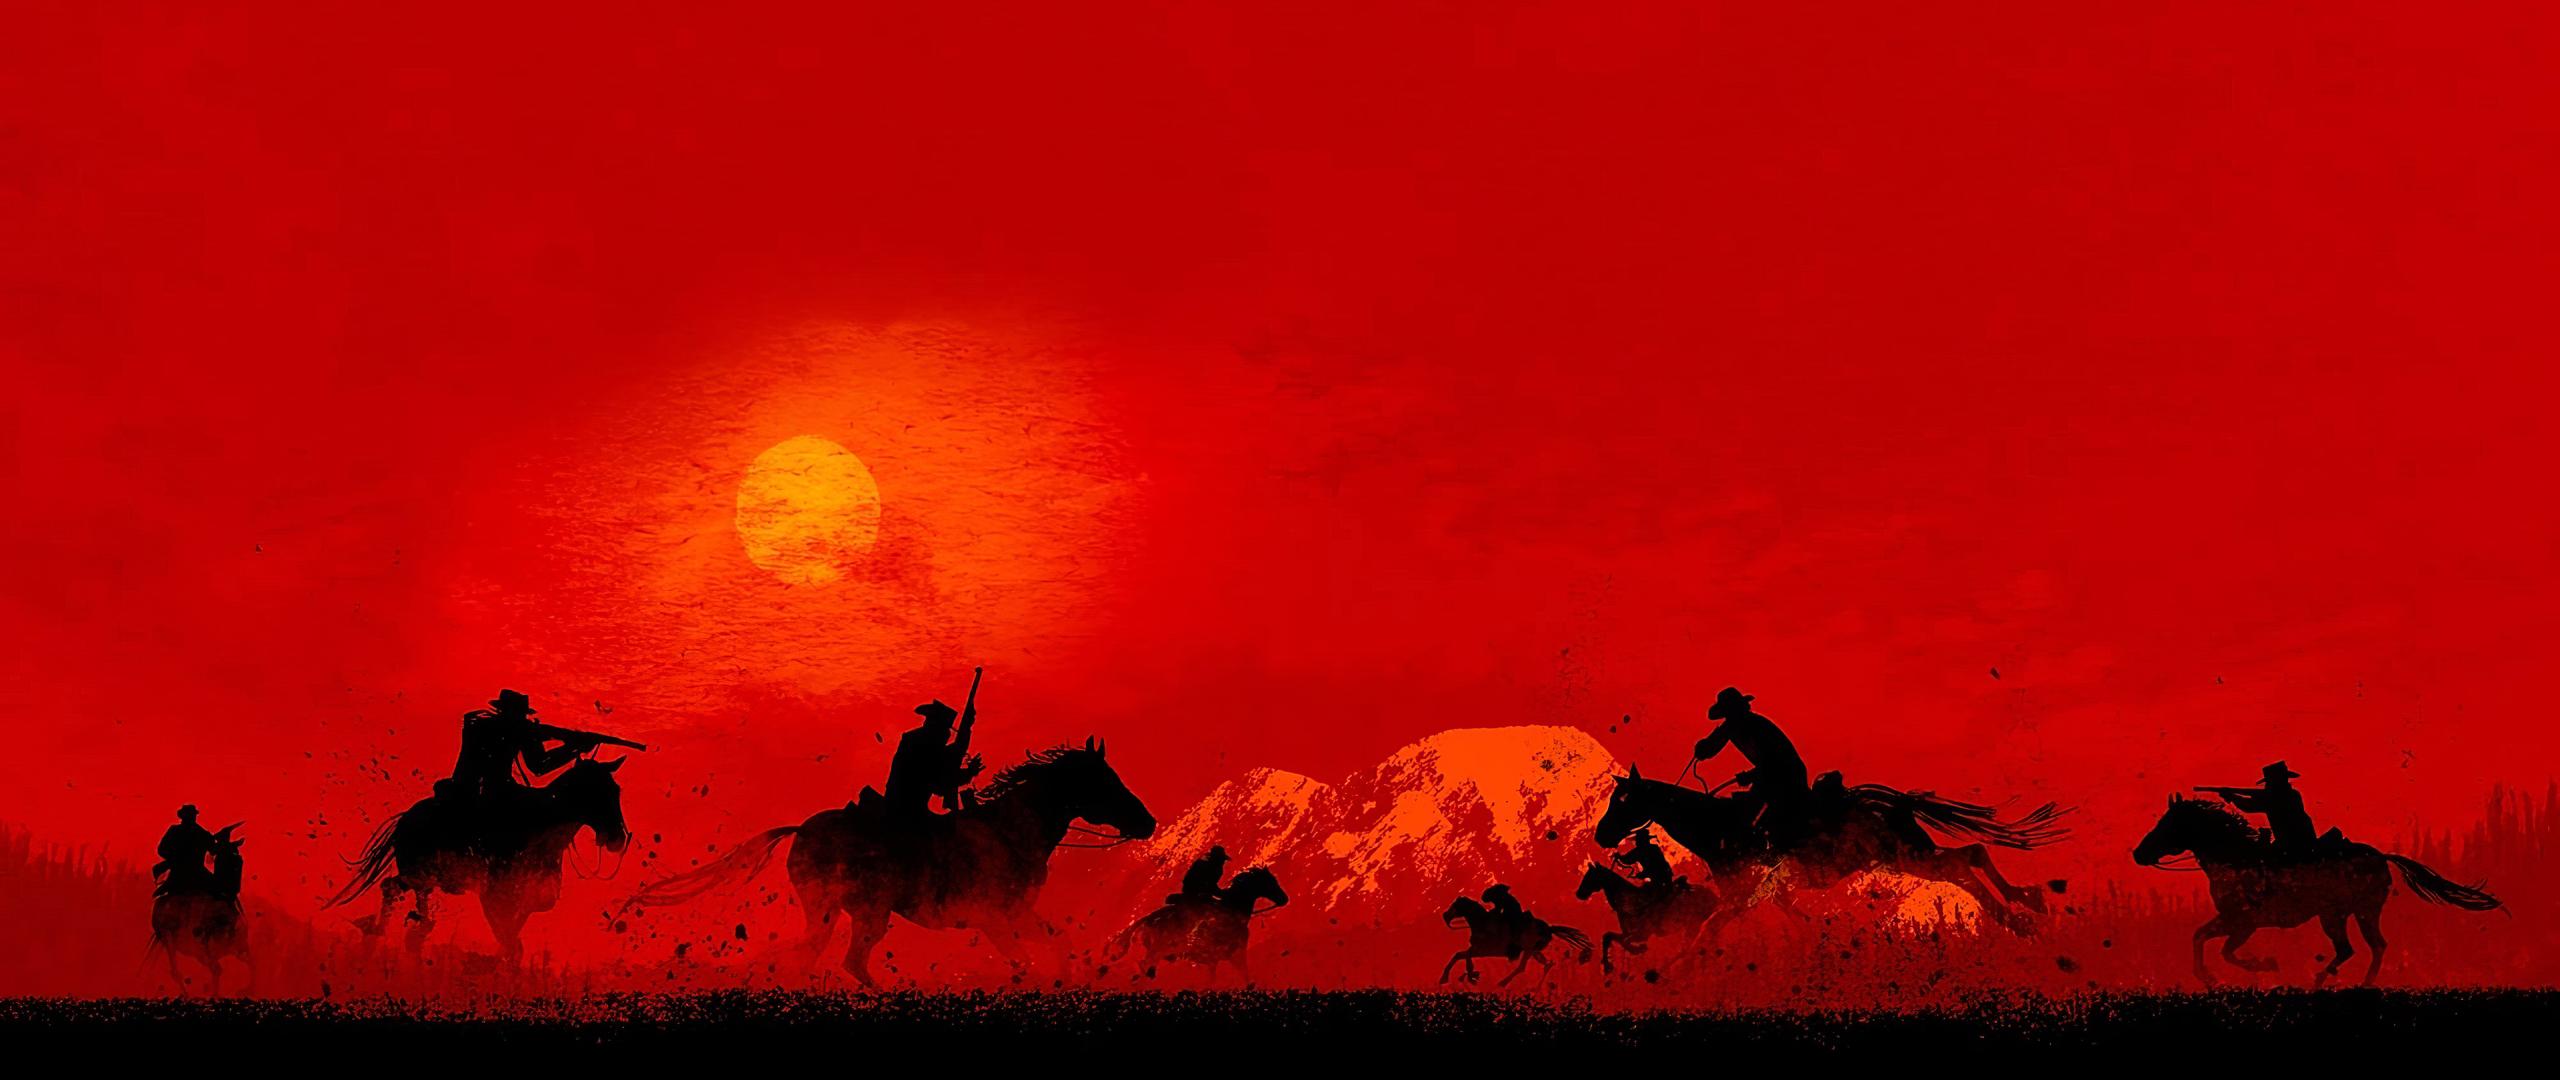 2560x1080 Red Dead Redemption 2 Game 2019 2560x1080 ...